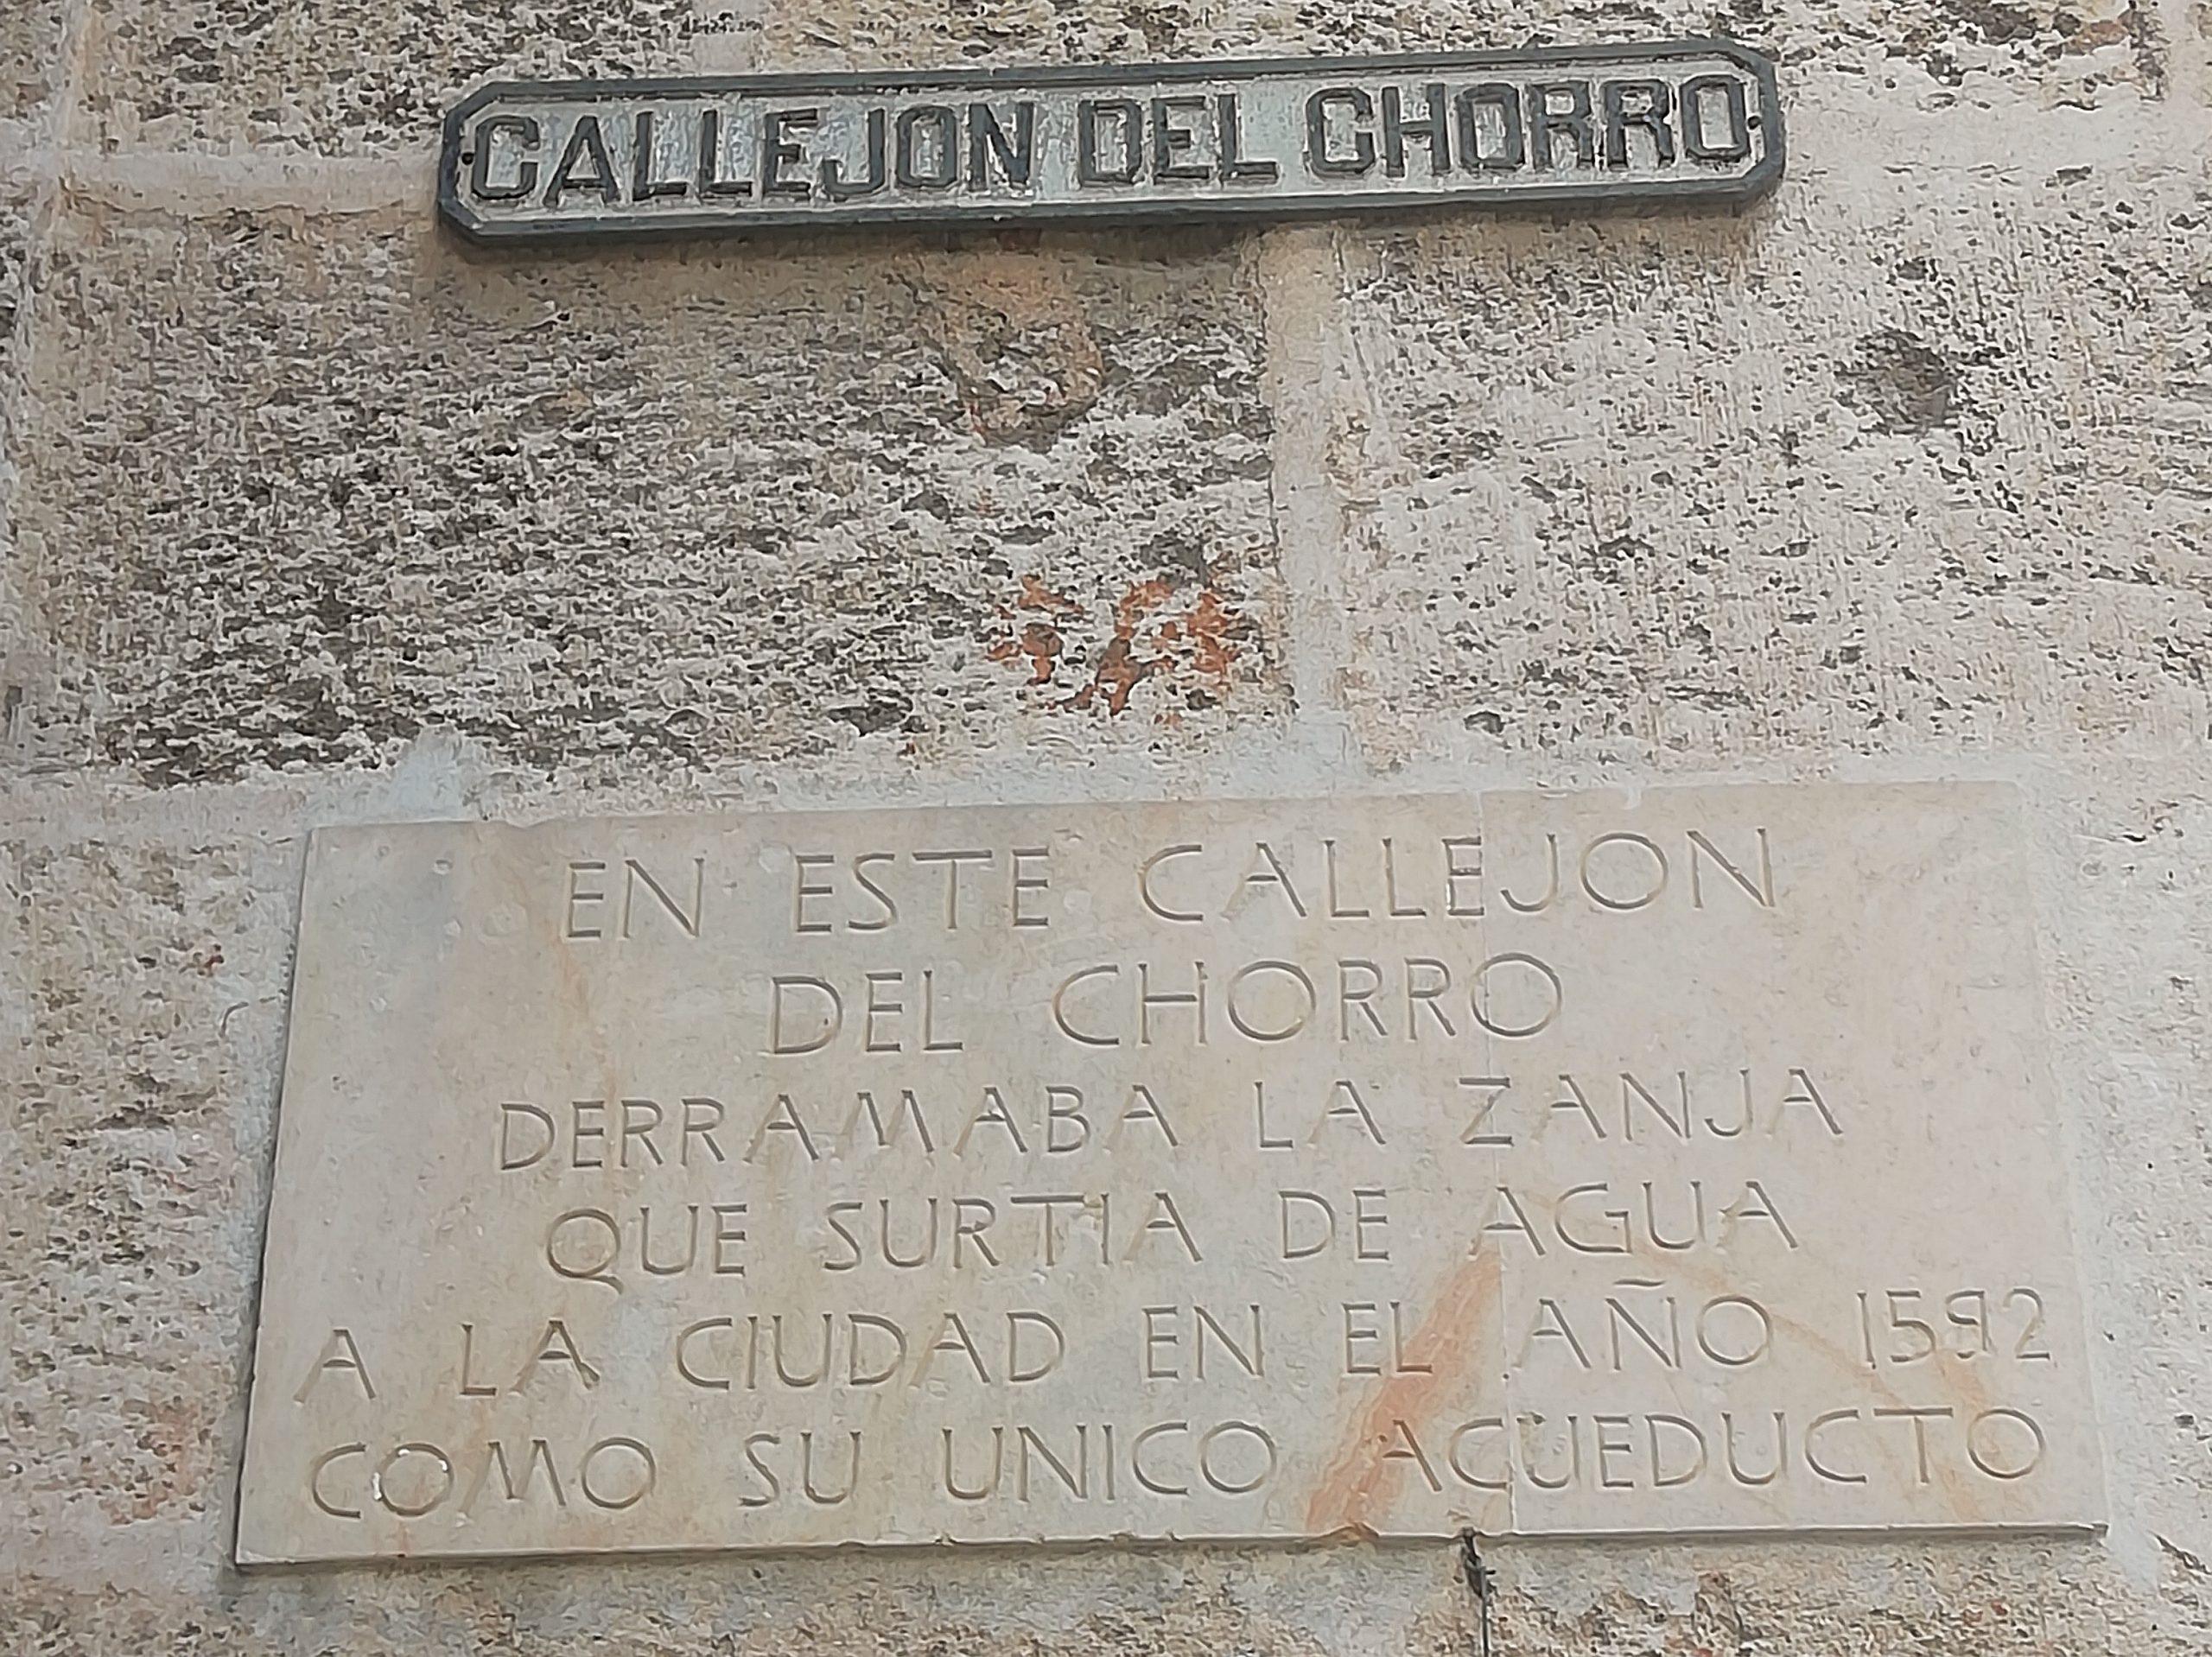 Callejon del Chorro La Habana scaled